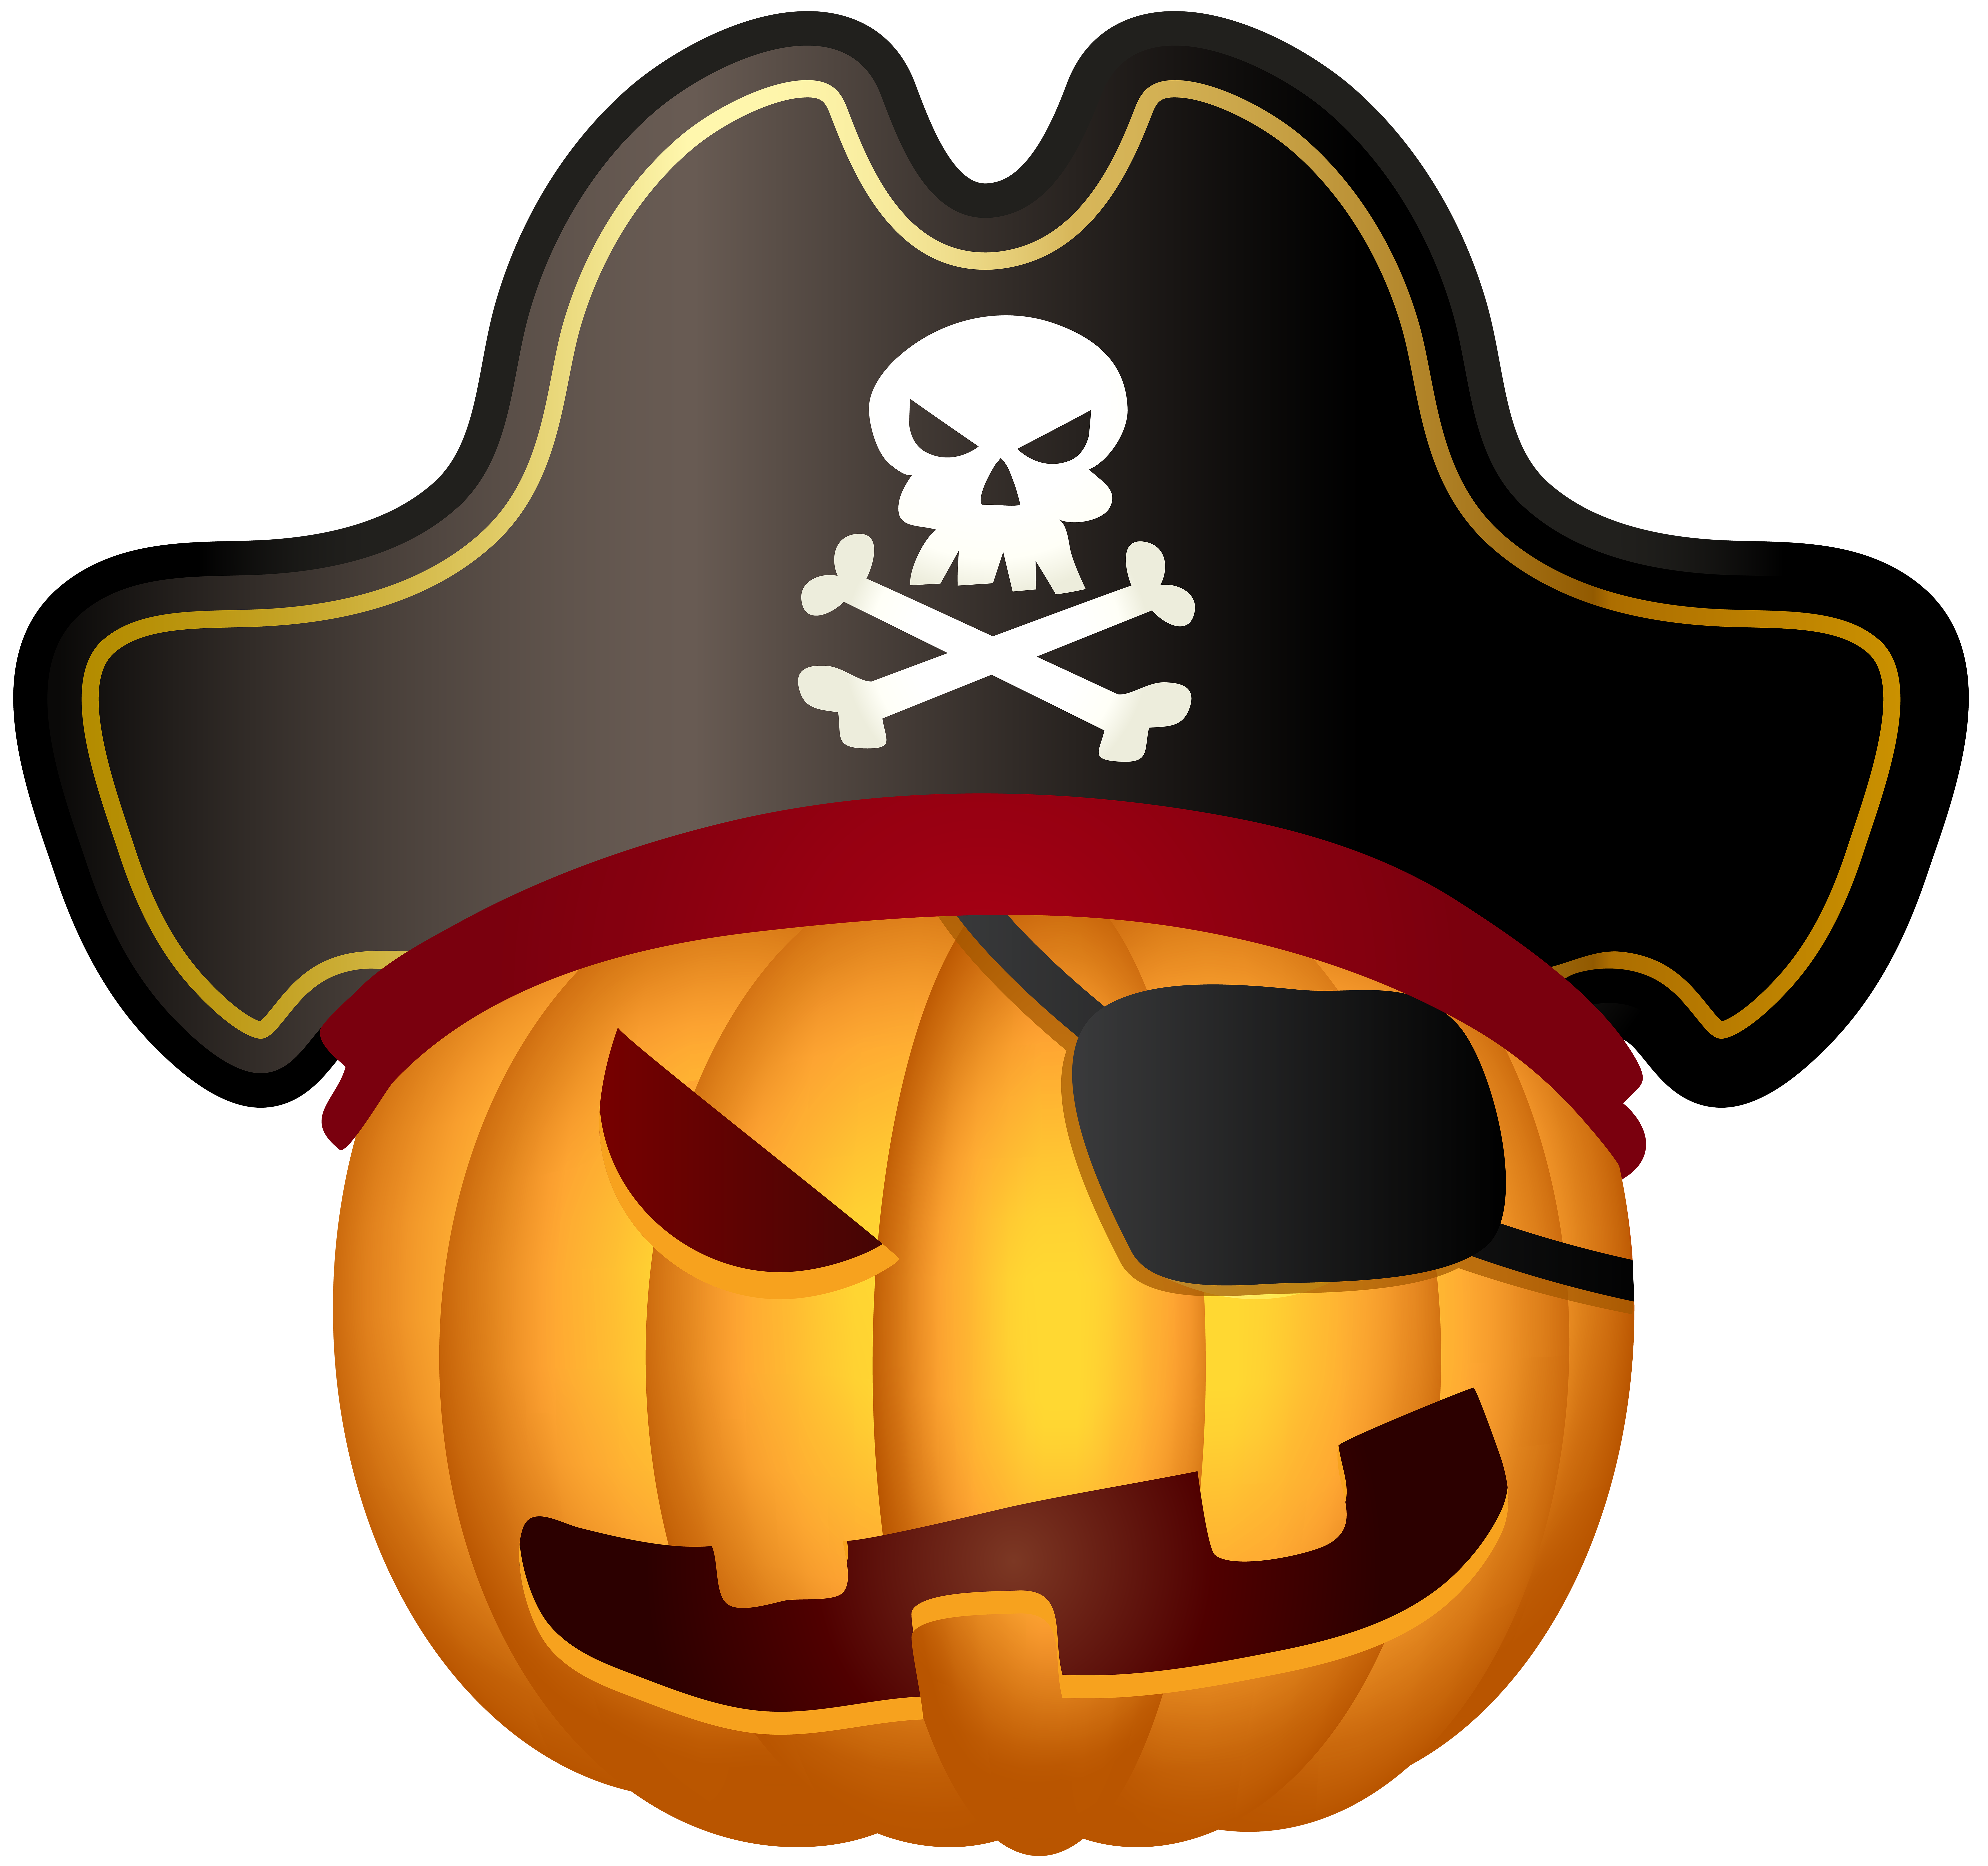 Pumpkin pirate clipart graphic black and white Halloween Pirate Pumpkin PNG Clip Art Image | Gallery Yopriceville ... graphic black and white